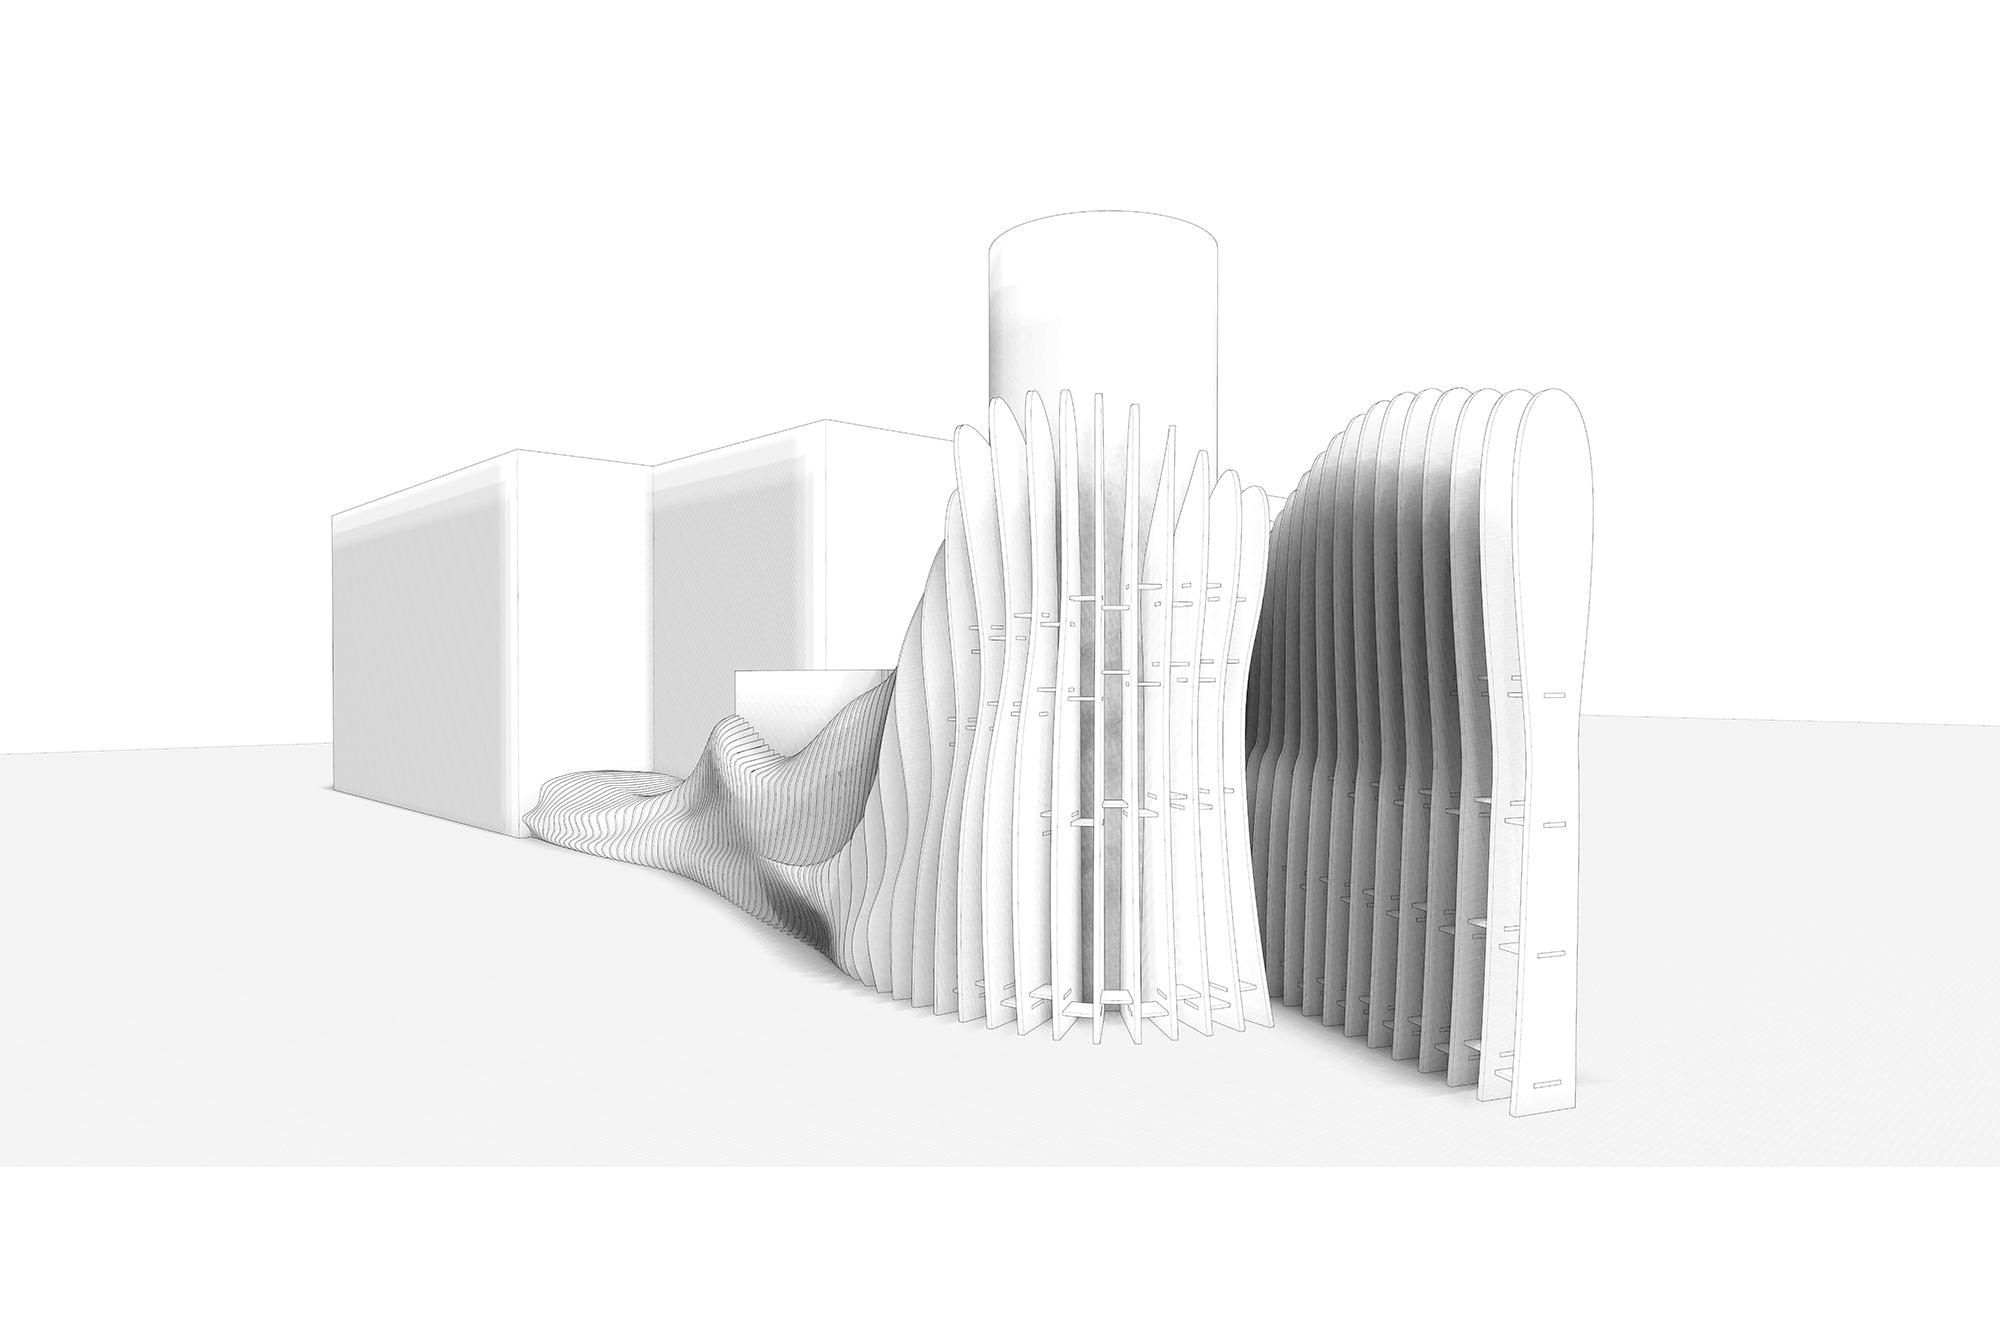 Internos-_-Diseño-_-EXarchitects_011